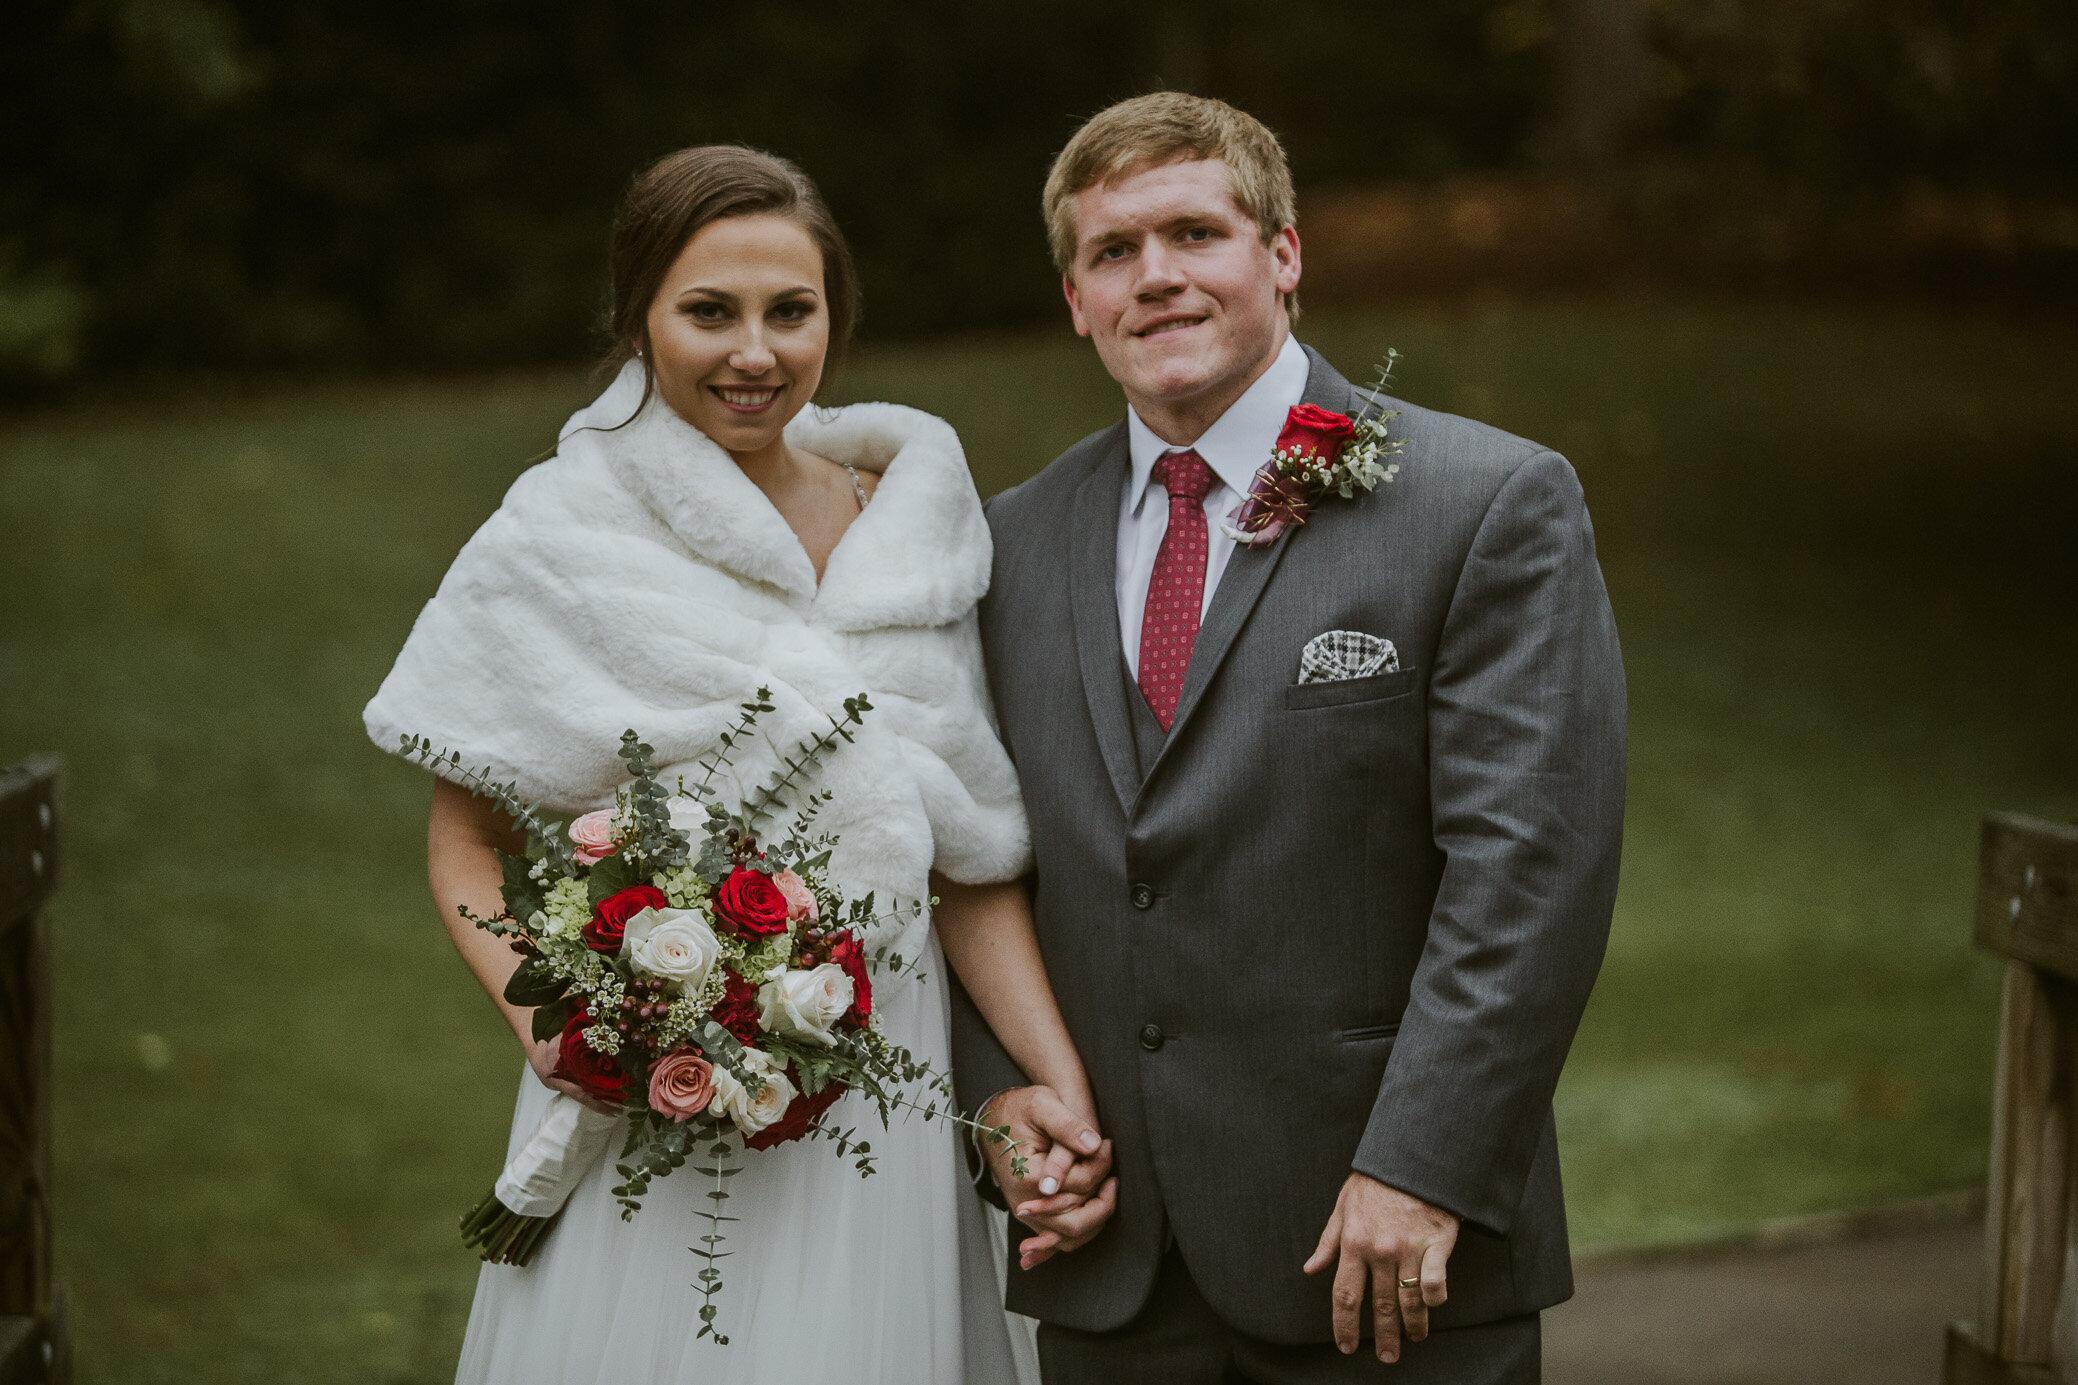 Spokane, Washington wedding photography and elopement photography pricing information. Rates start at $1,800.